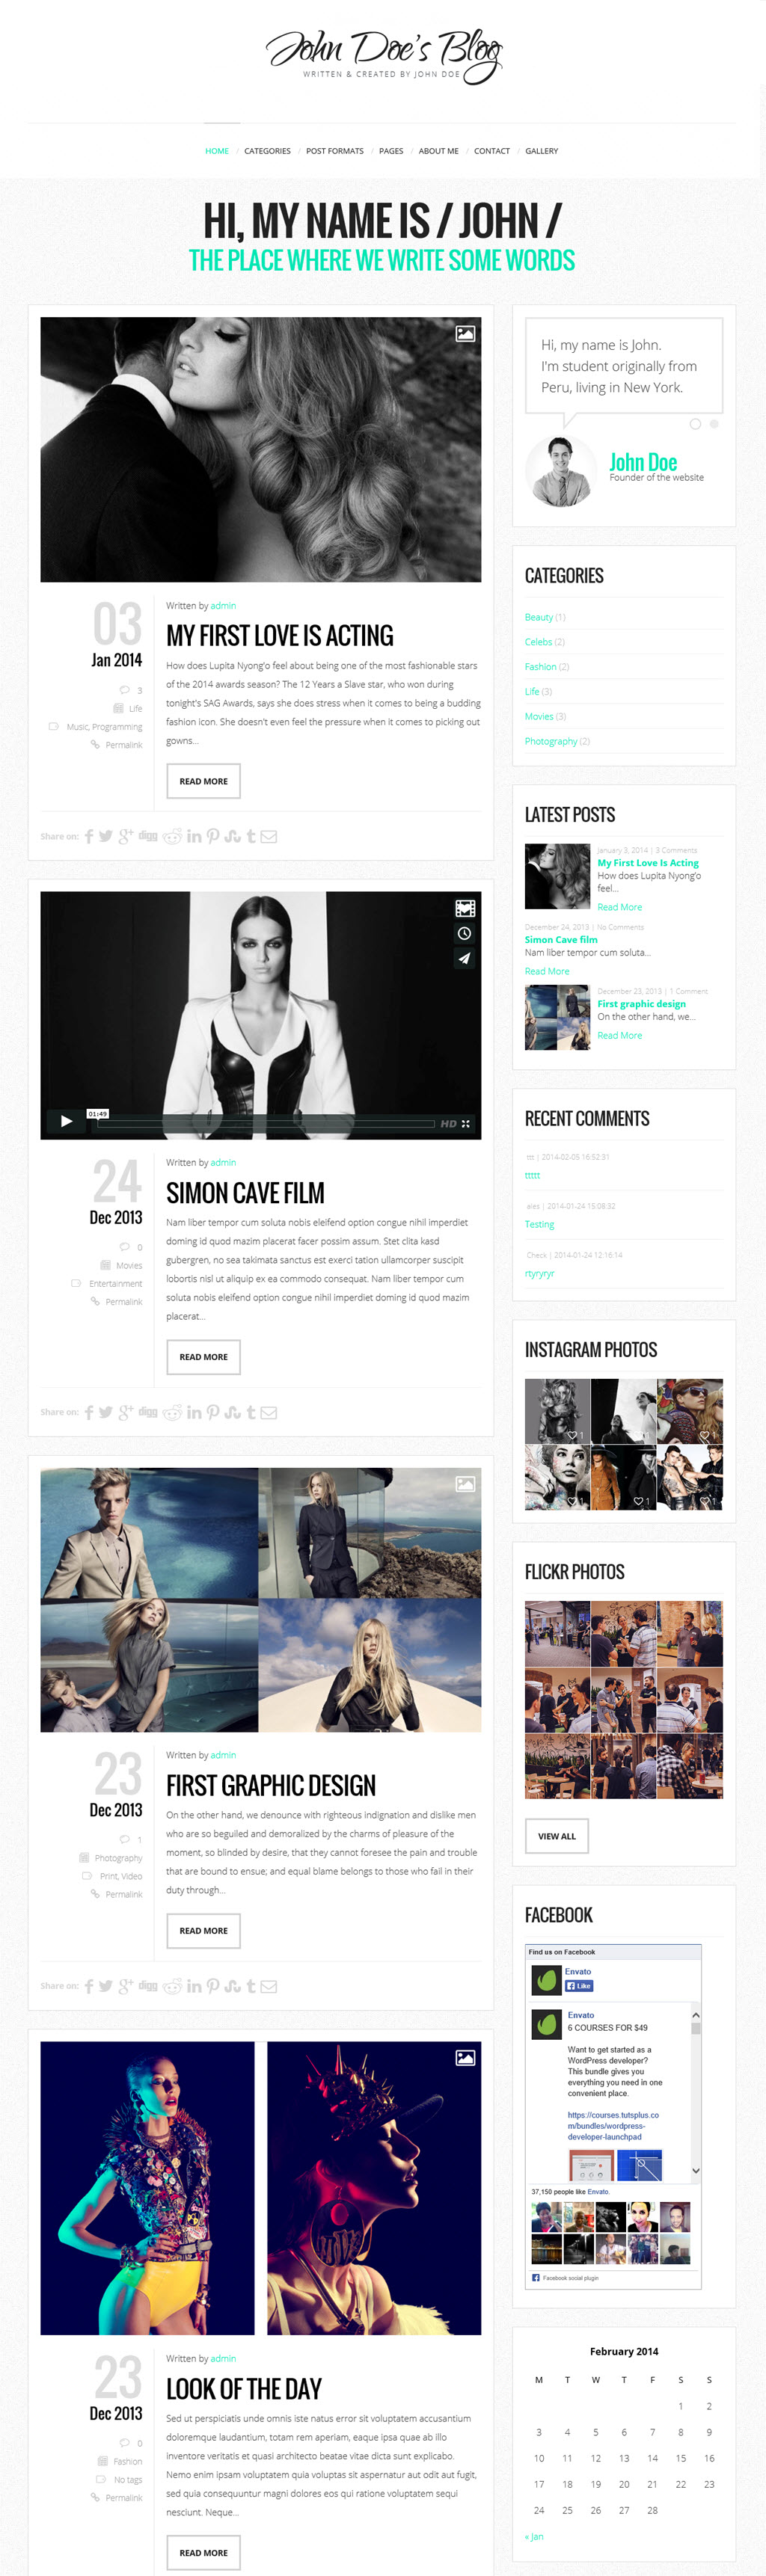 John Doe's Blog – Clean & Personal WordPress Blog Theme